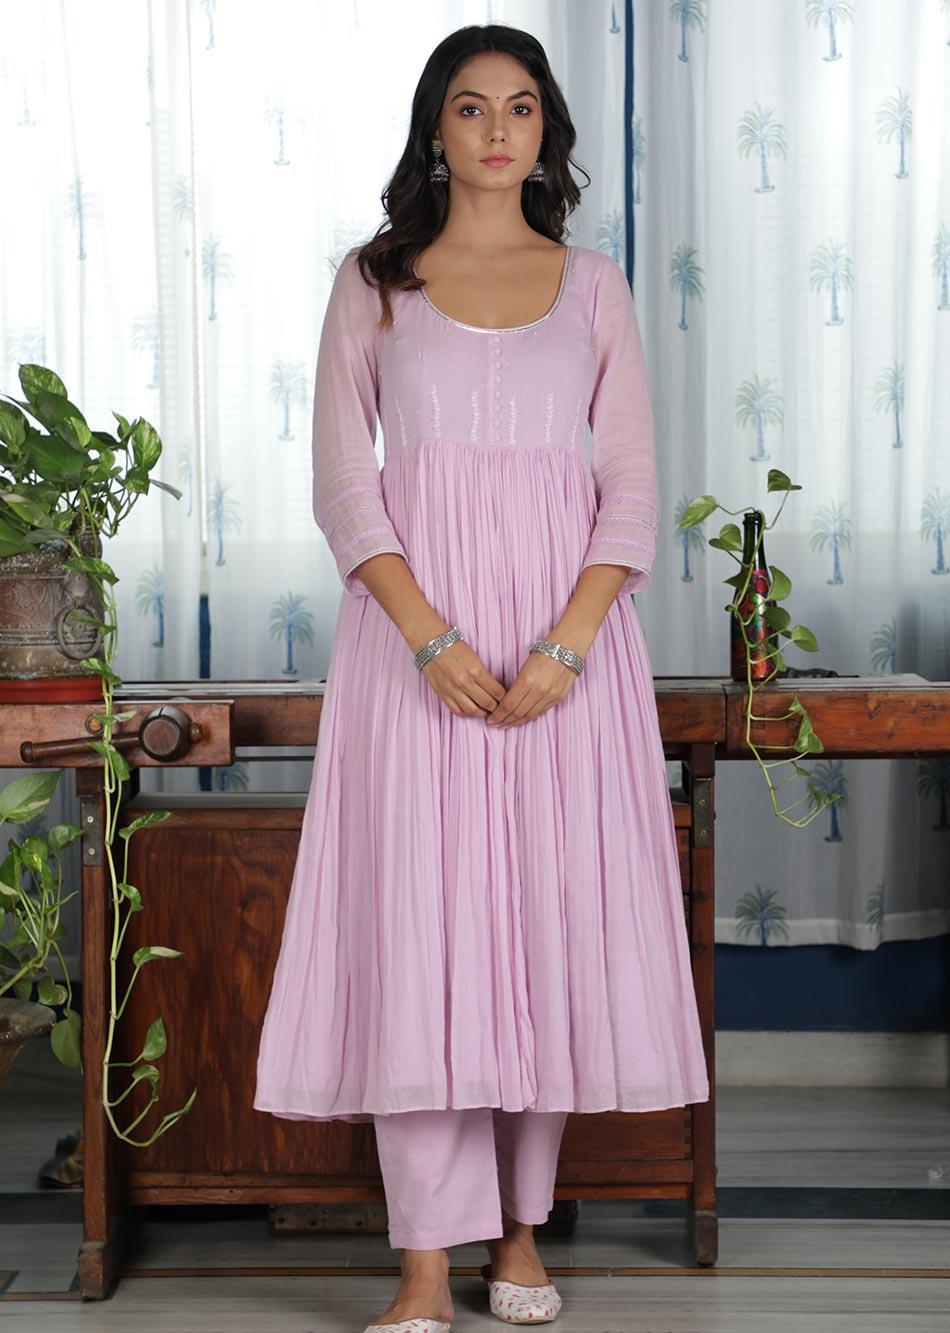 MOH Lilac Gathered Anarkali (only kurta) By Jovi Fashion